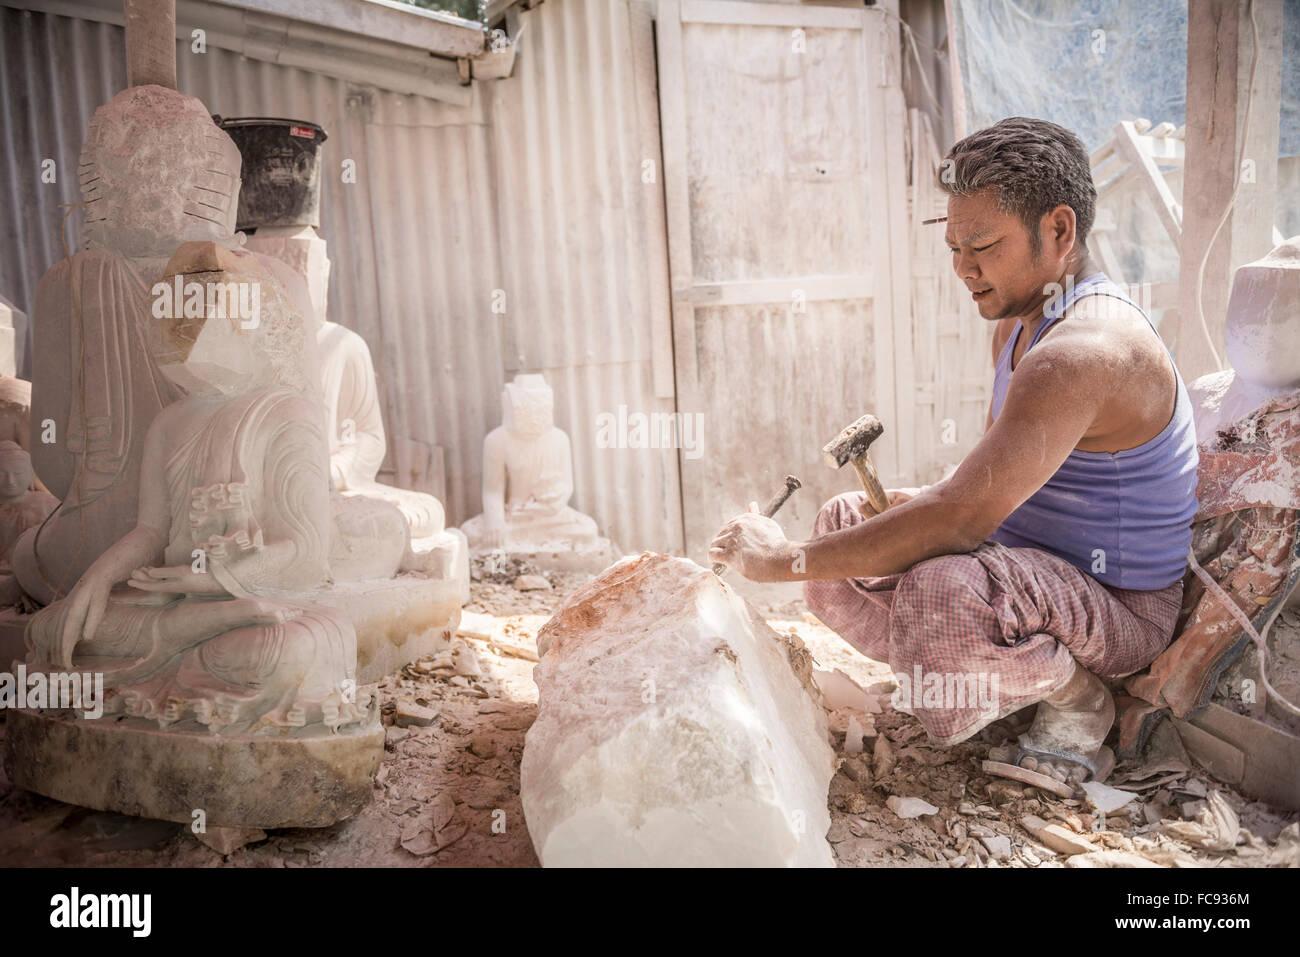 Starting to carve a Buddha image, Mandalay, Mandalay Region, Myanmar (Burma), Asia - Stock Image